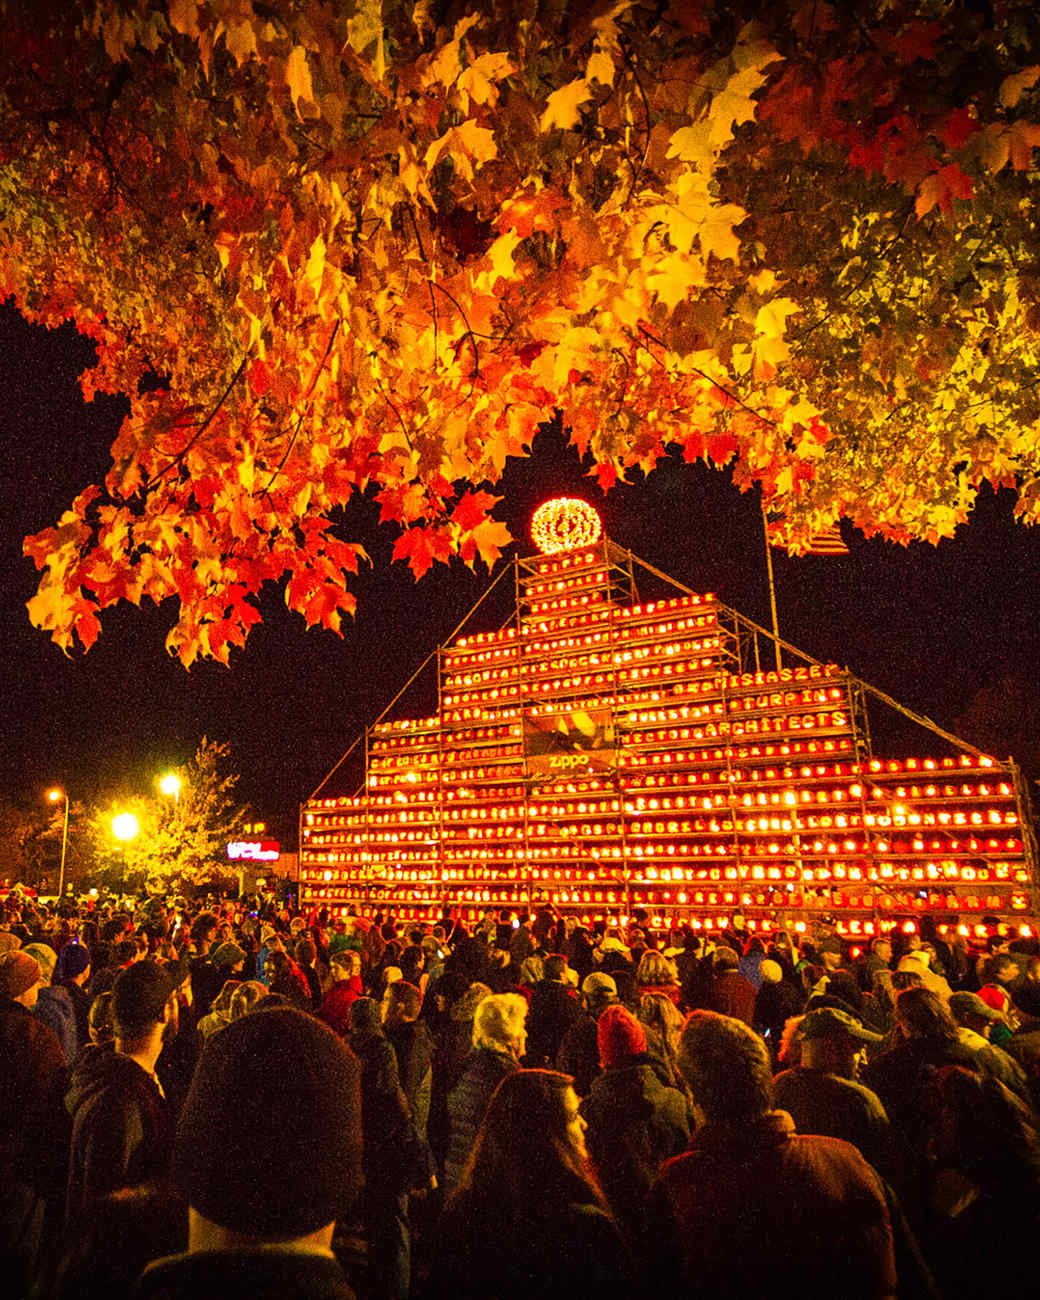 jack-o-lantern pumpkin festival display